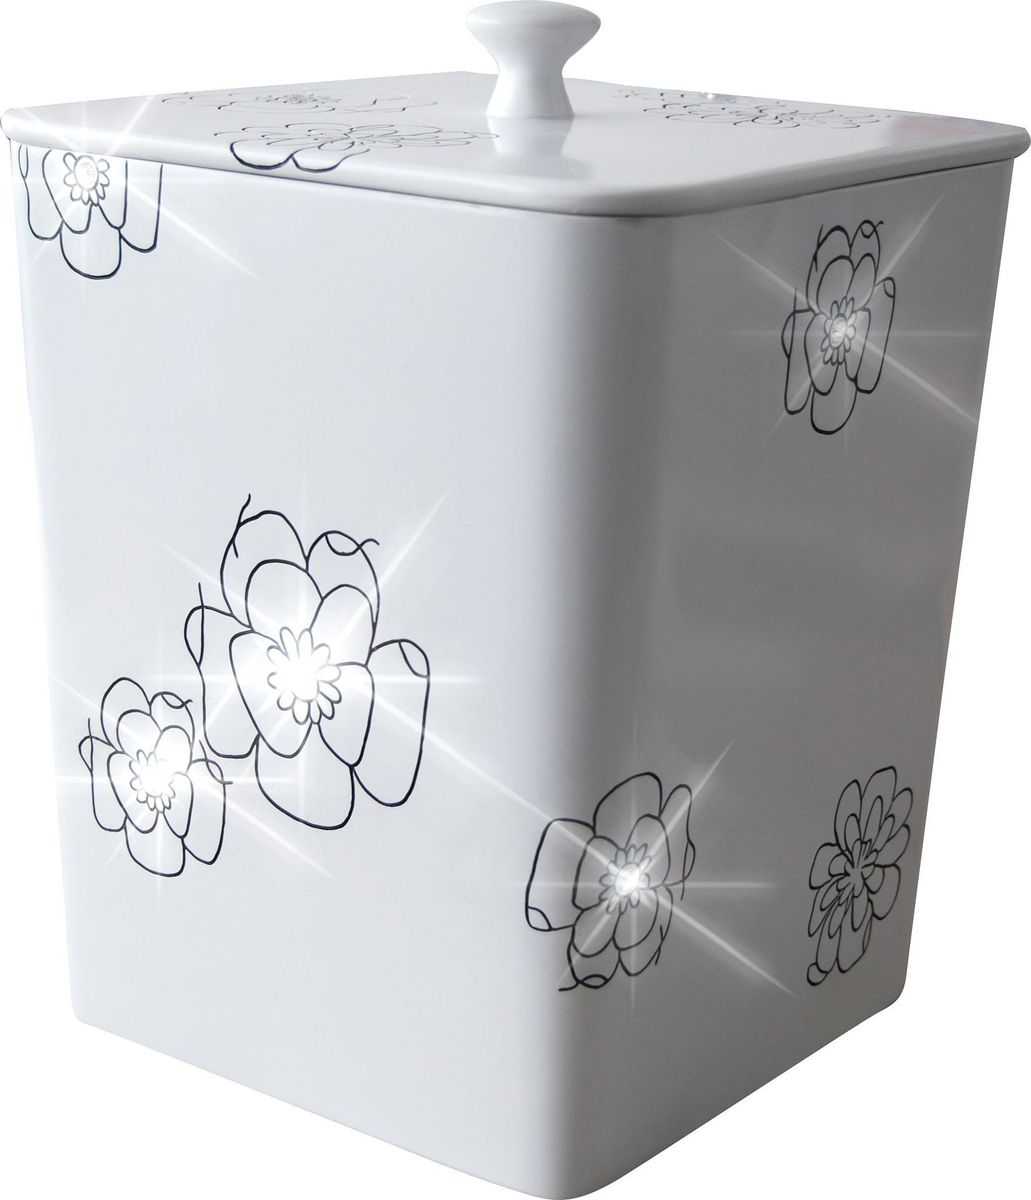 Ведро мусорное Ridder Diamond, цвет: белый, 8,5 л мусорное ведро сенсорное спб